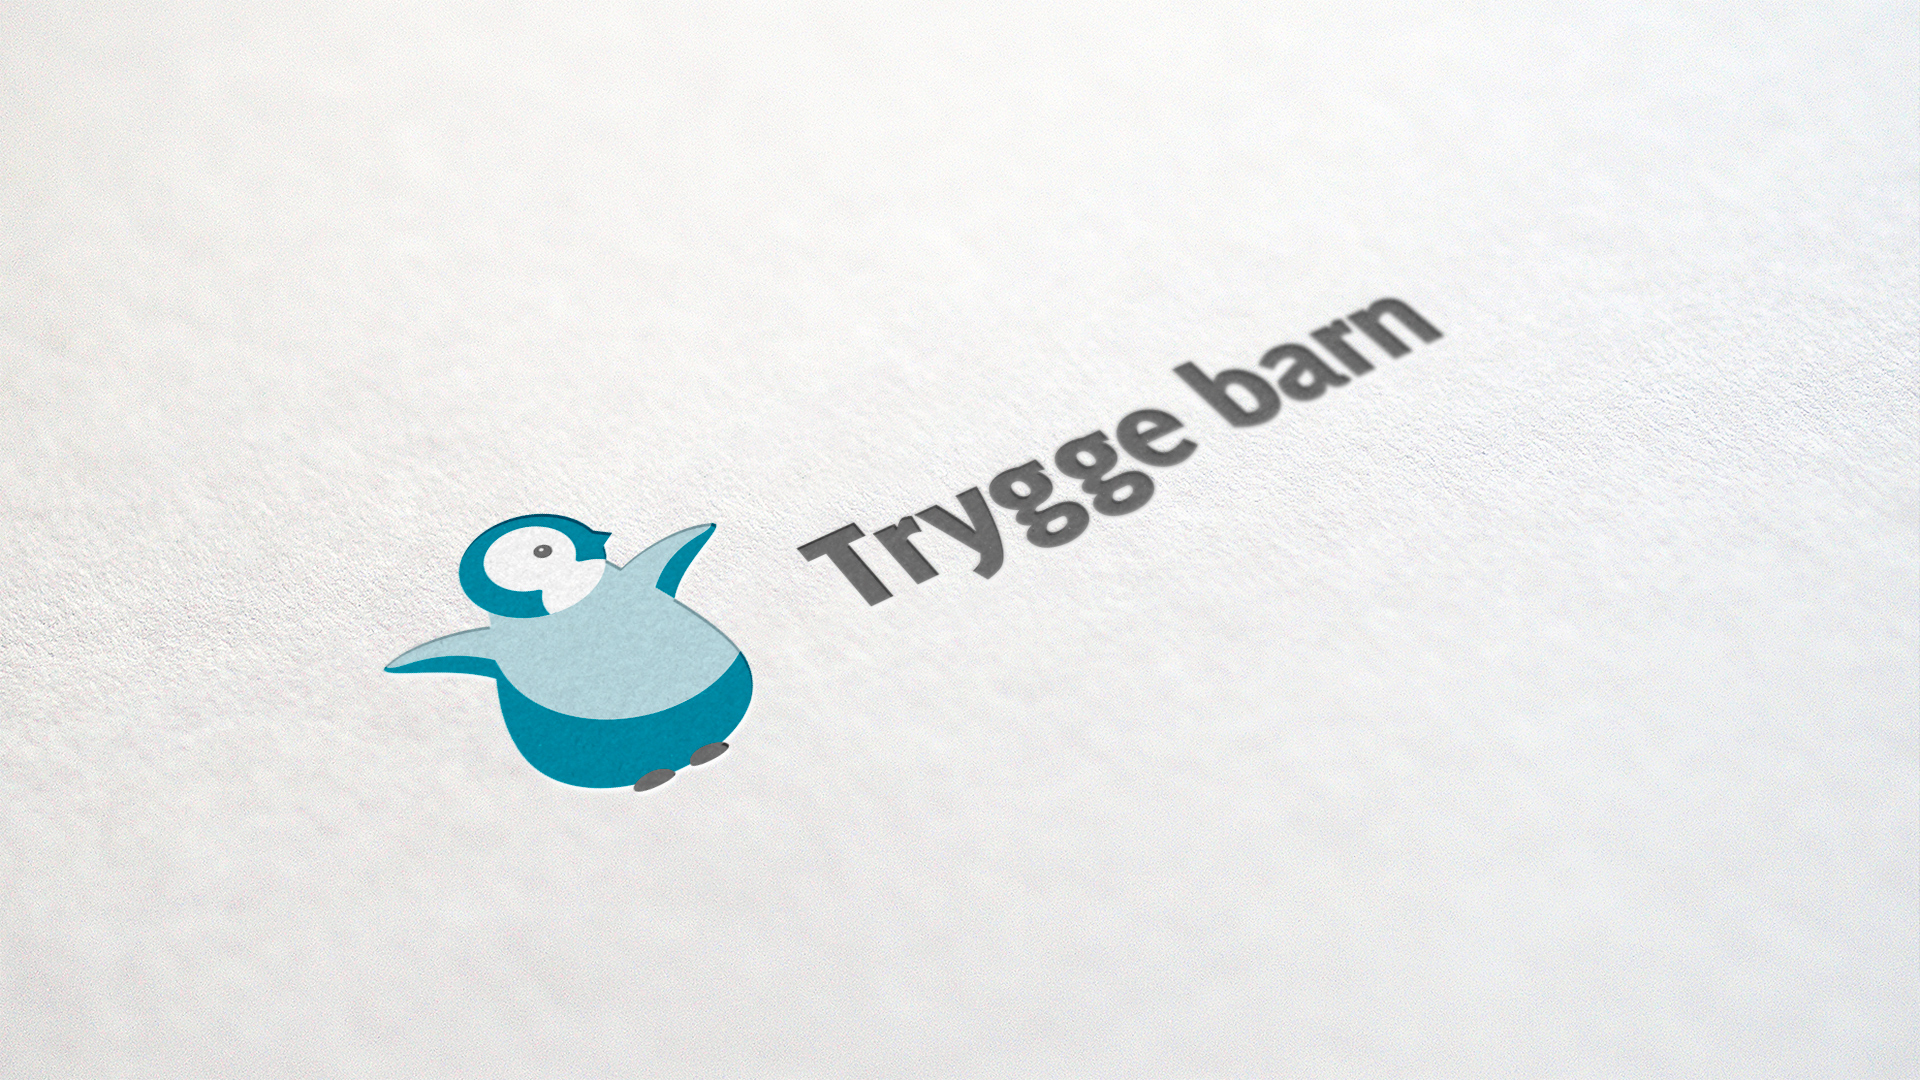 Trygge-barn-logo